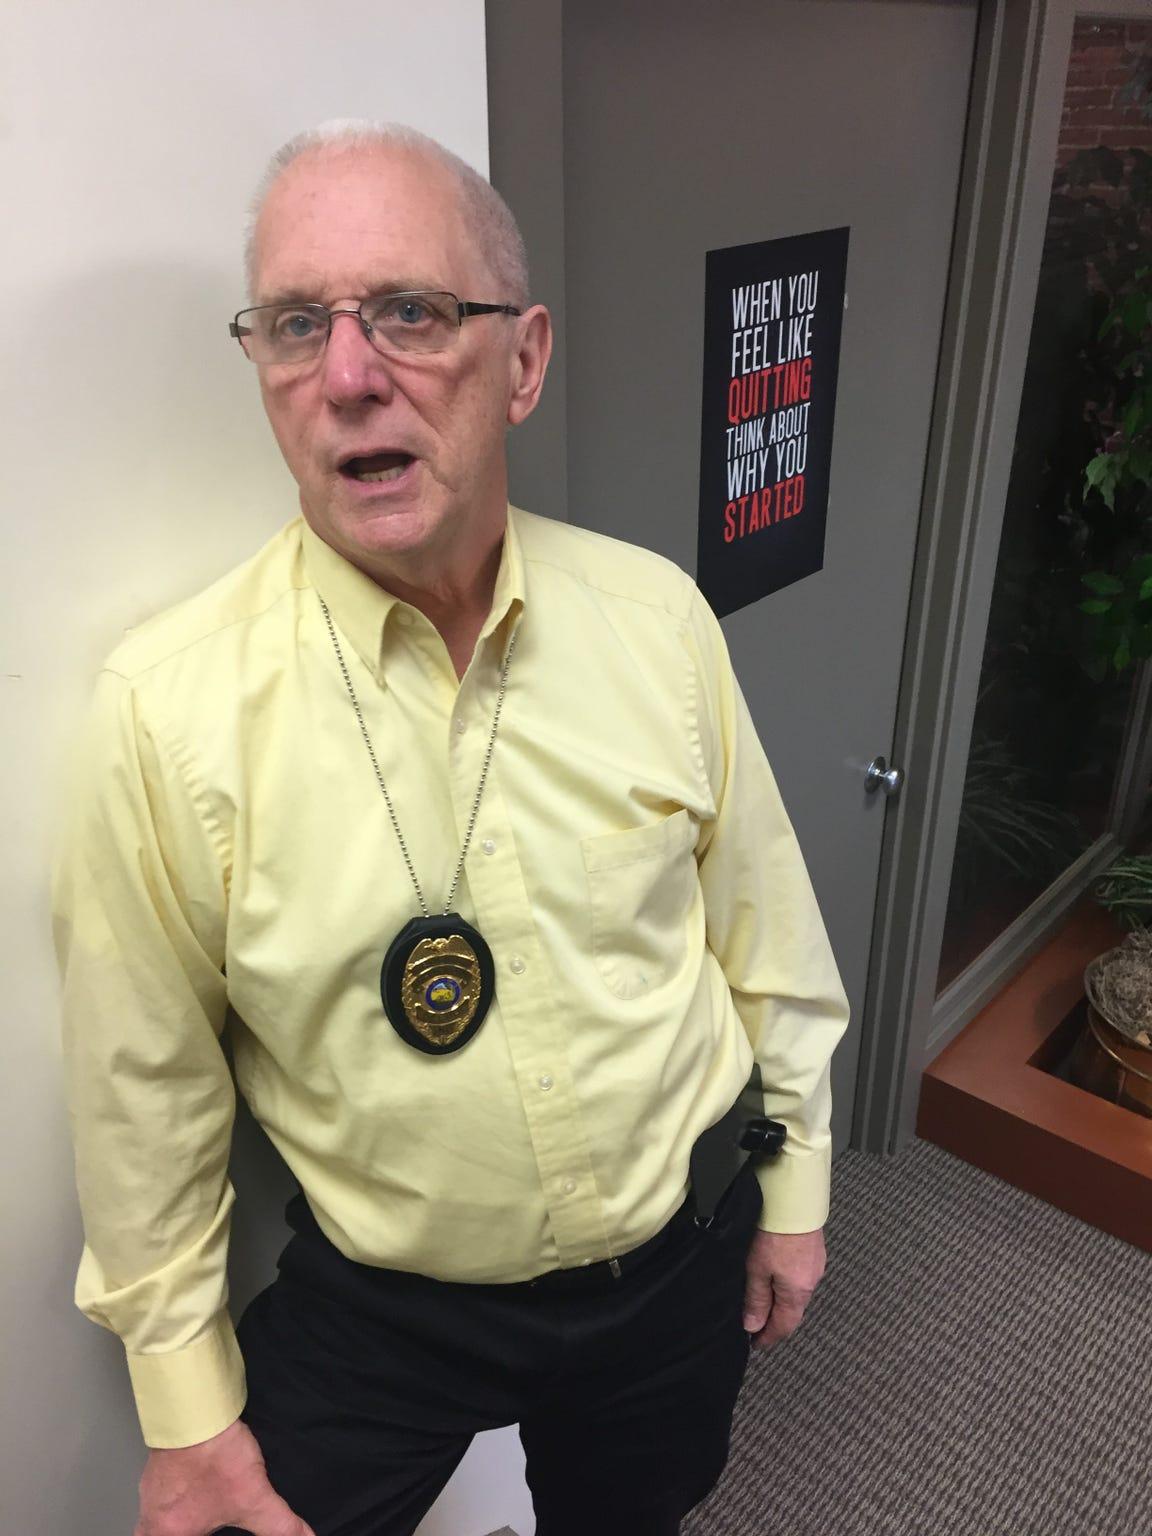 Pastor Ed Selvidge, chaplain for the Carroll County